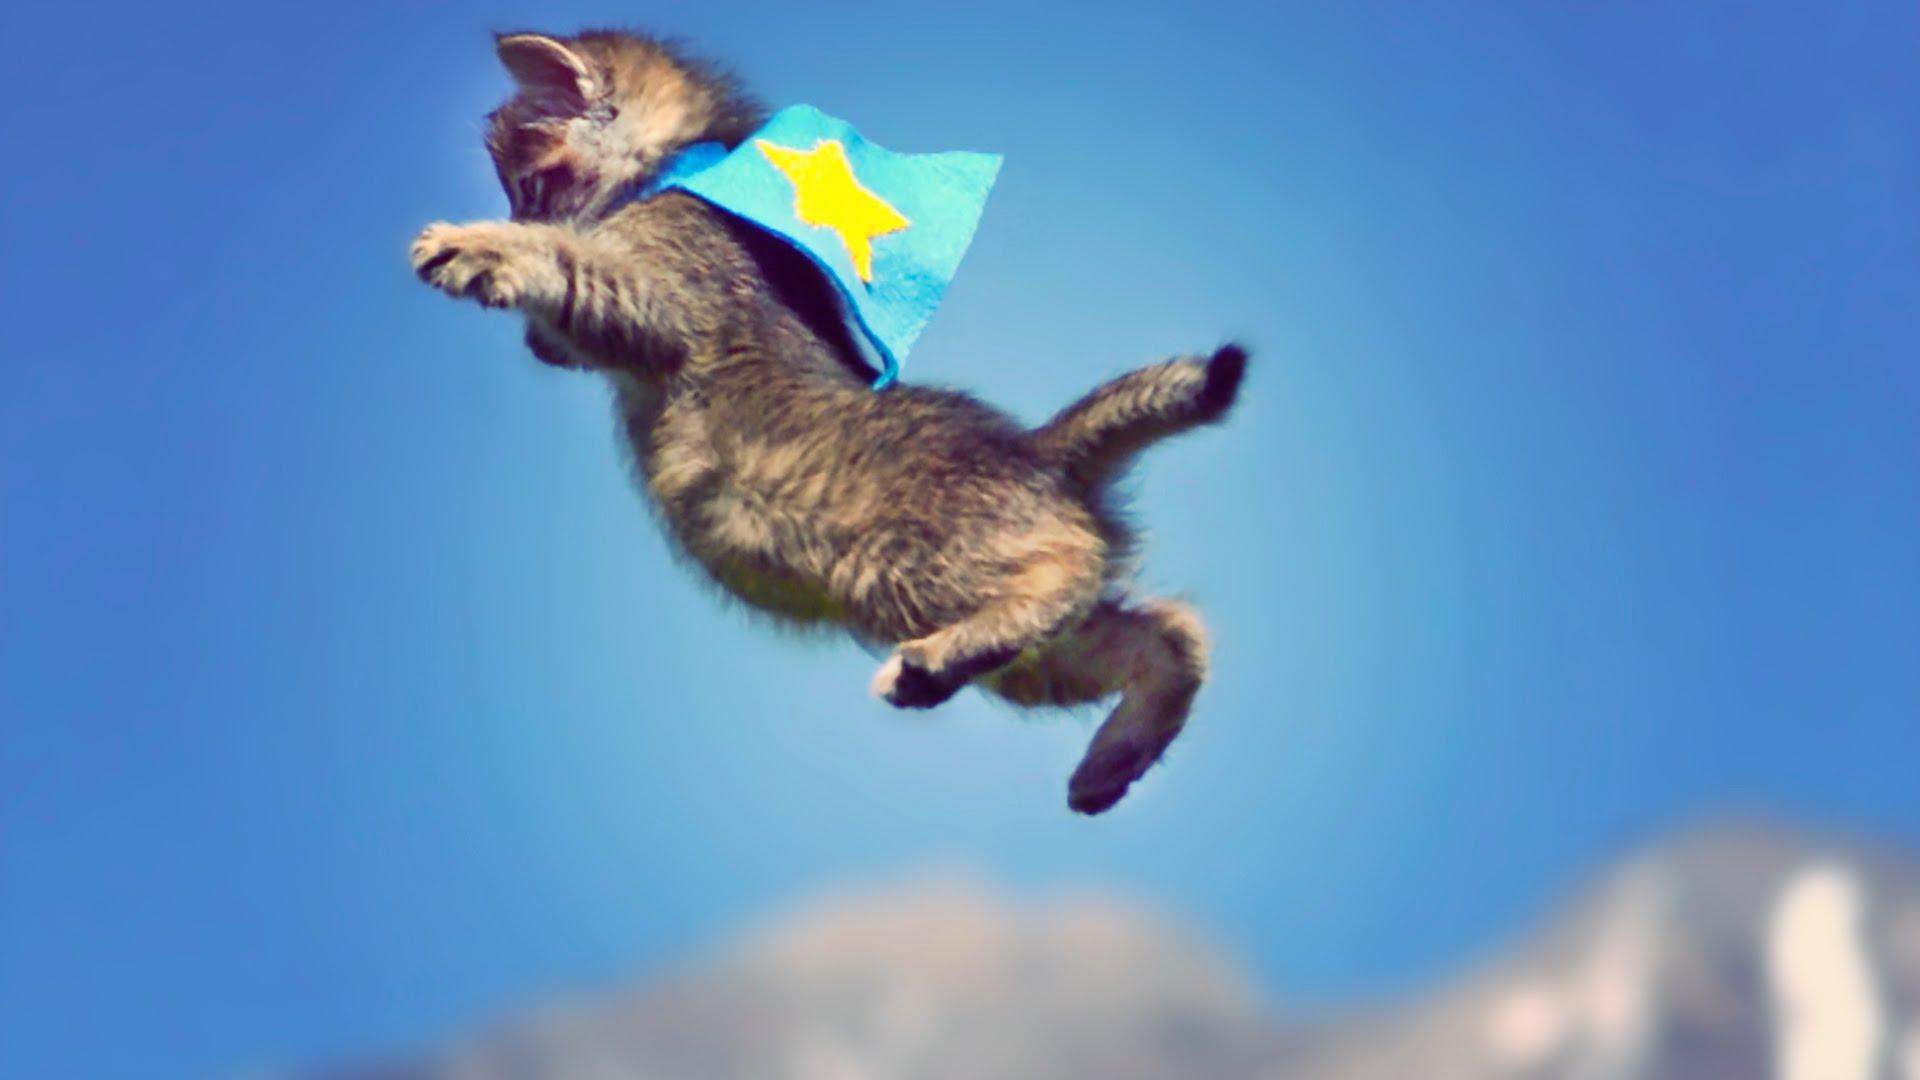 CUTE KITTENS FLY IN SLOW MOTION! // ScottDW - YouTube